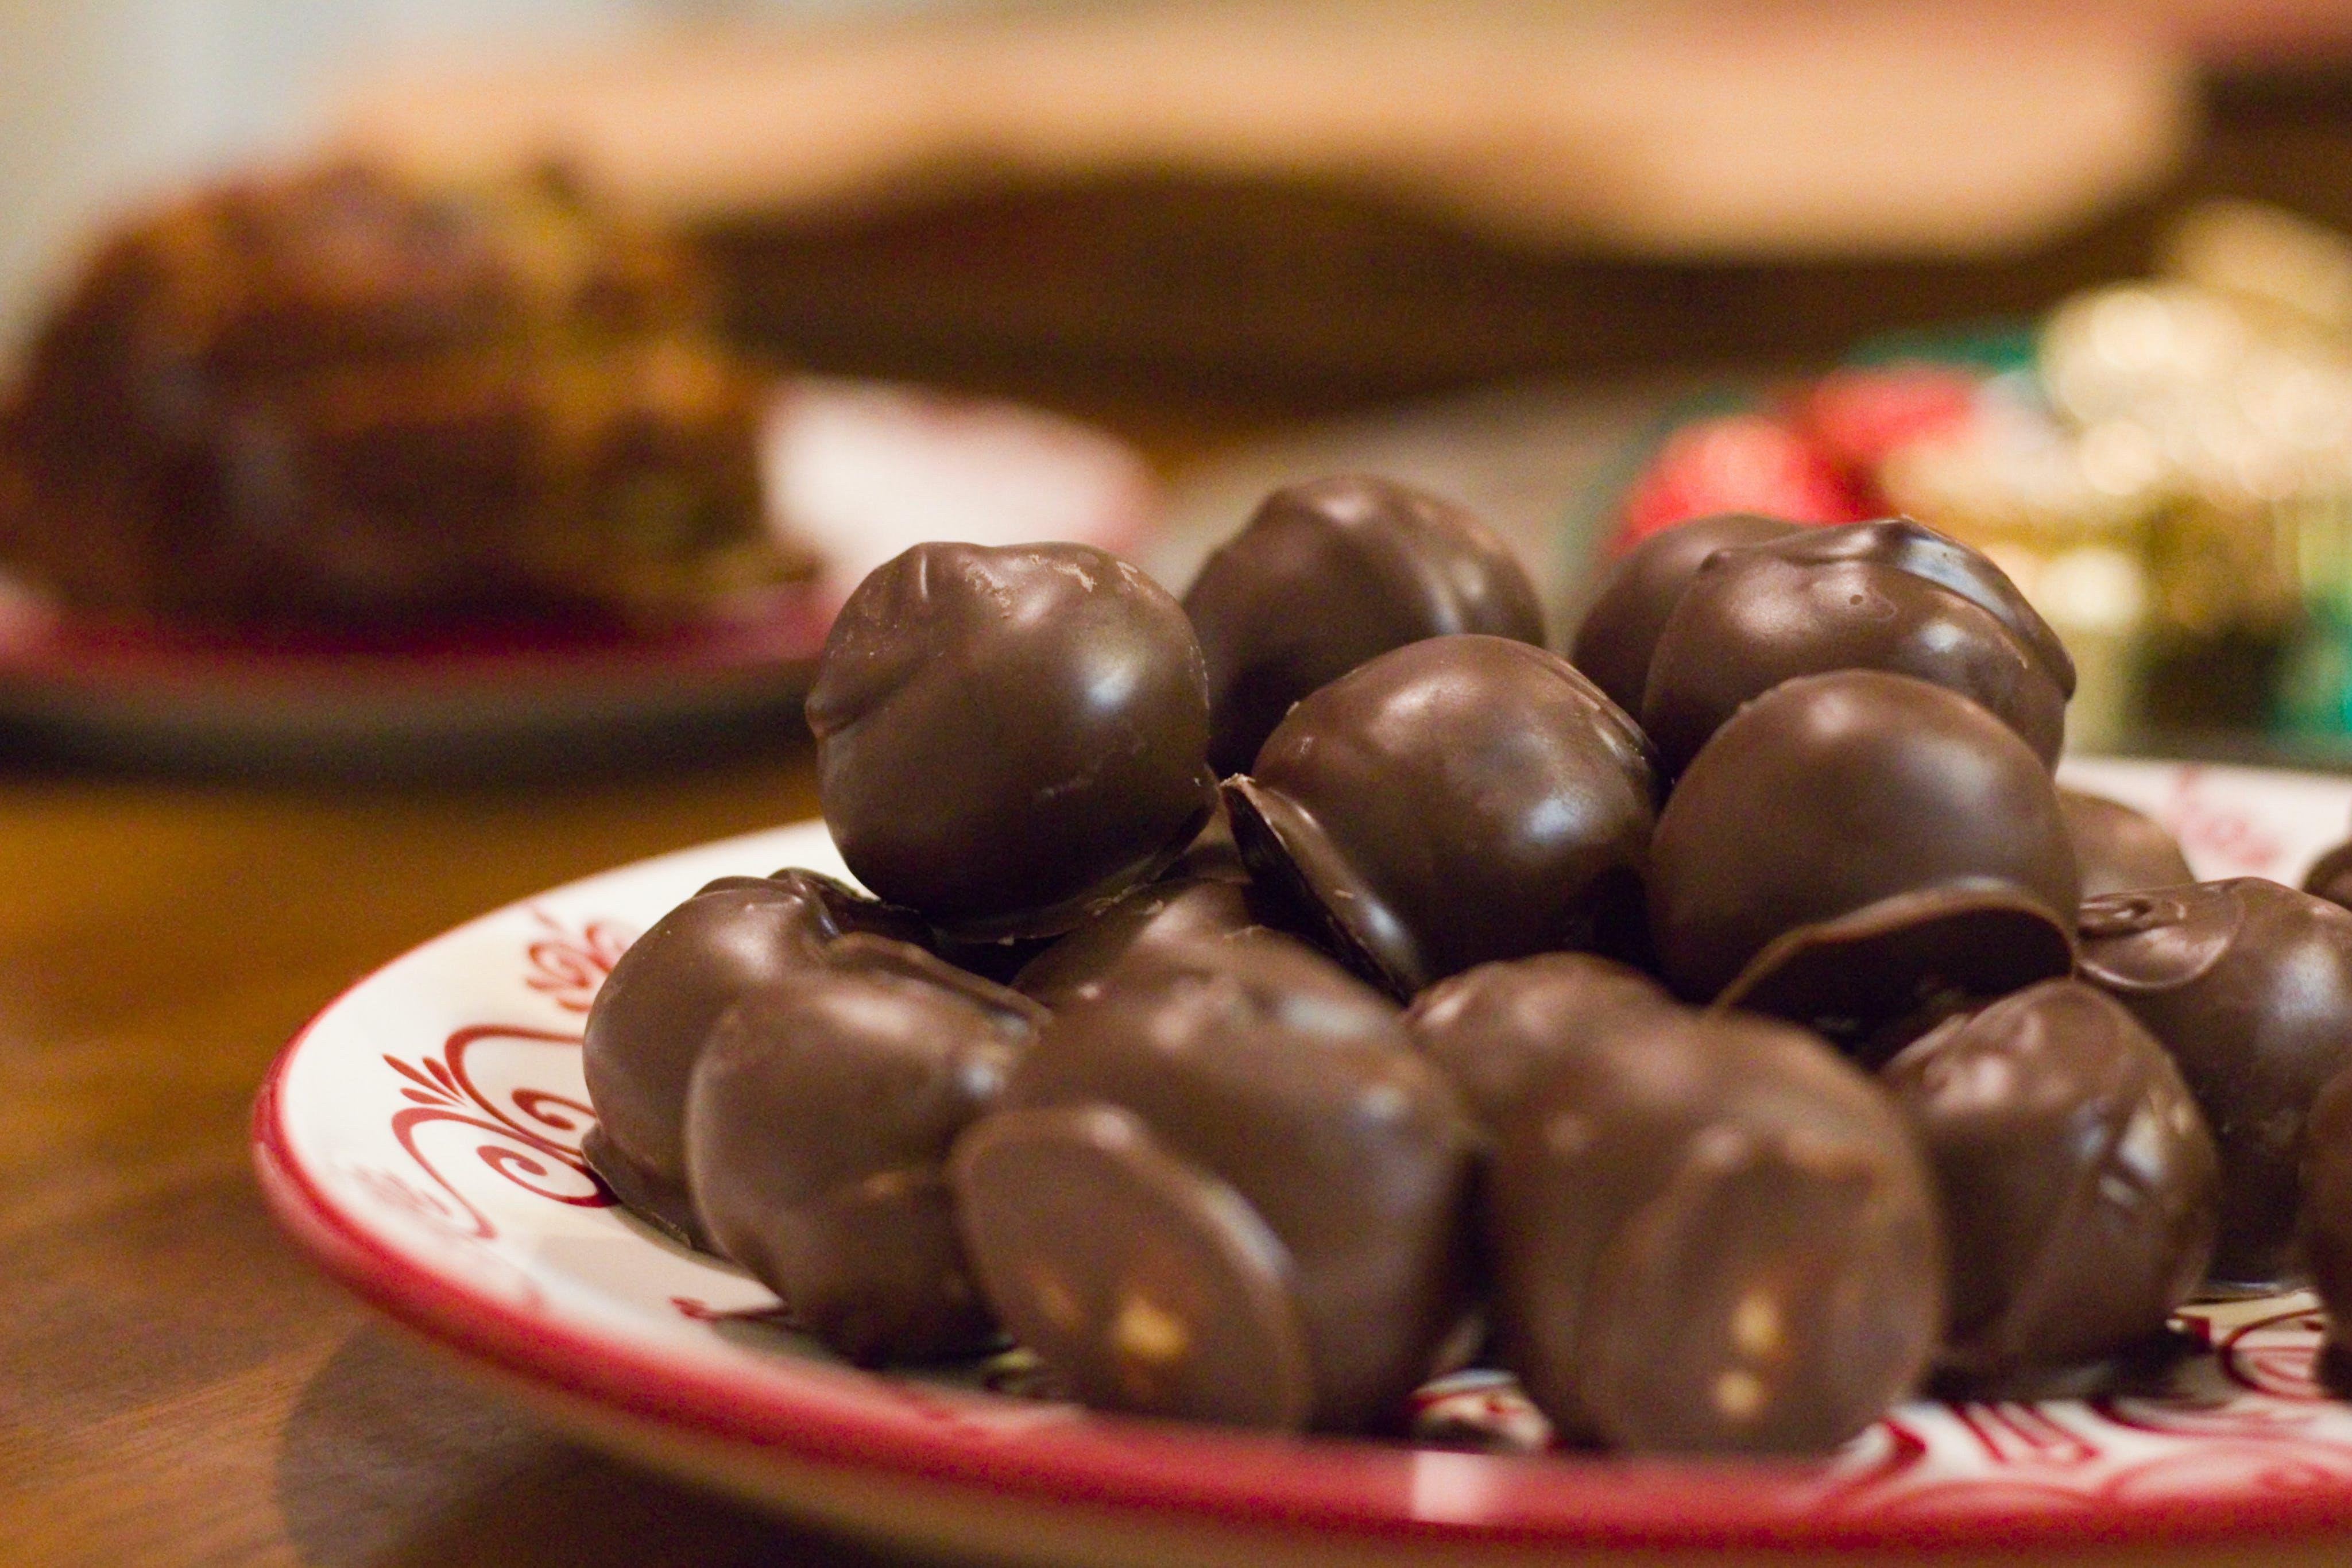 Free stock photo of holidays, chocolate, delicious, decorative